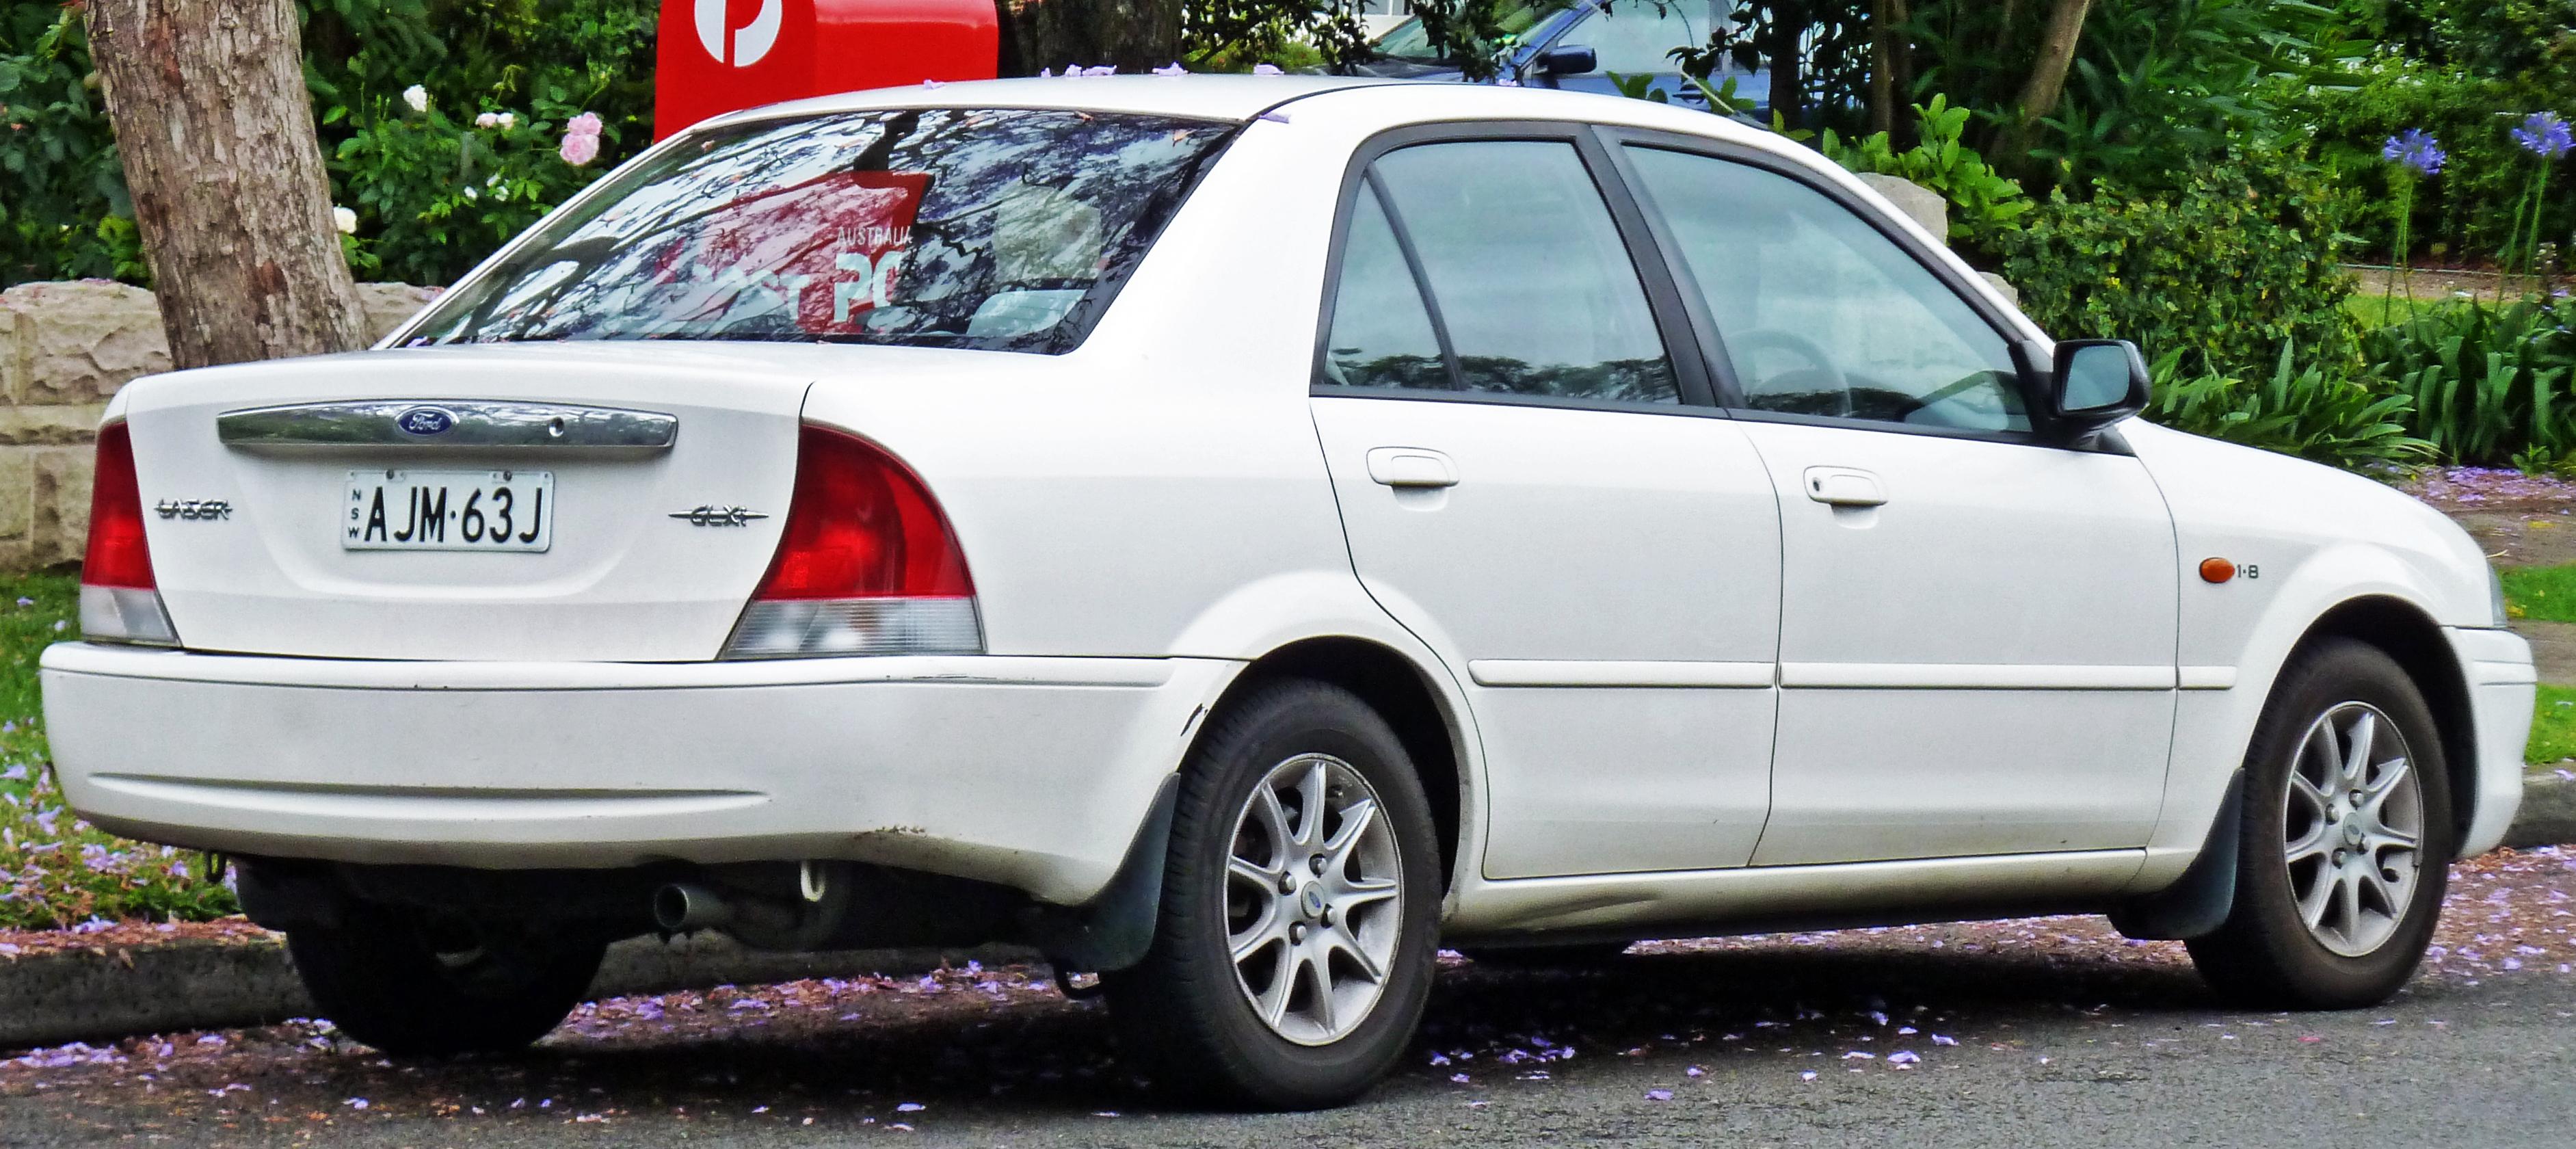 Ford Focus Wikipedia File:1999-2001 Ford Laser (KN) GLXi sedan 02.jpg ...